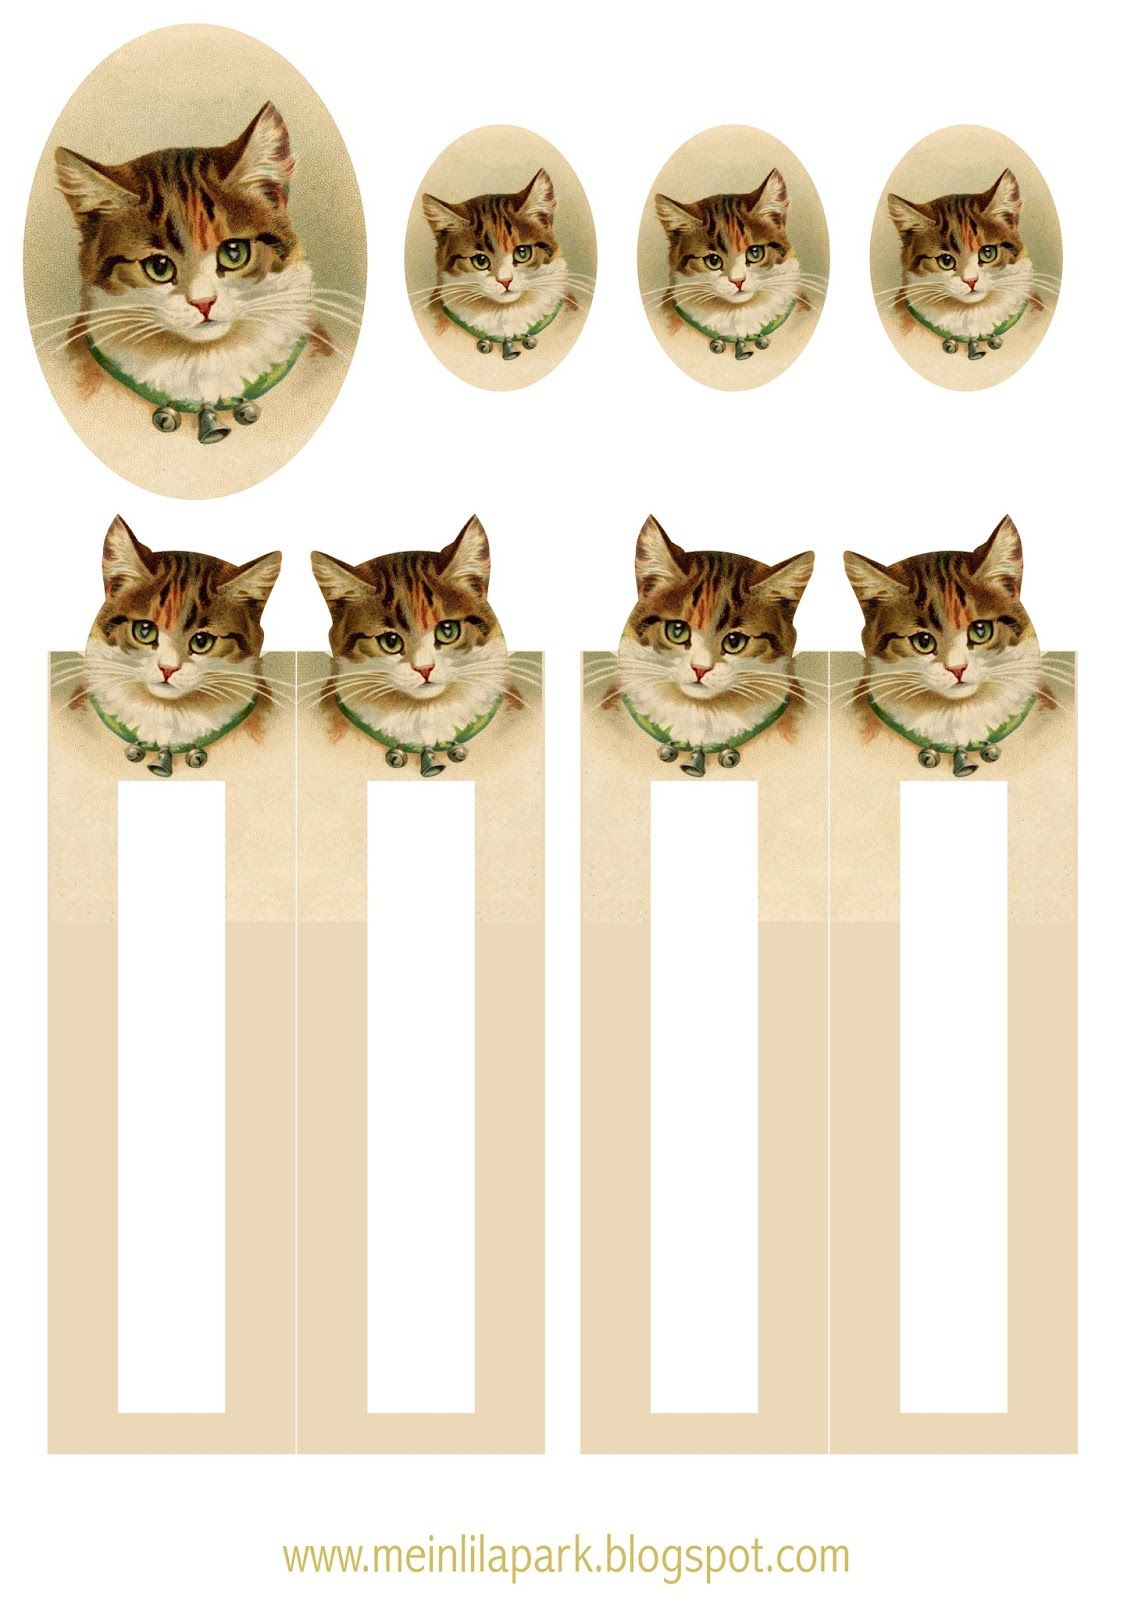 Free printable vintage cat bookmark - ausdruckbares Lesezeichen - freebie | MeinLilaPark – DIY printables and downloads